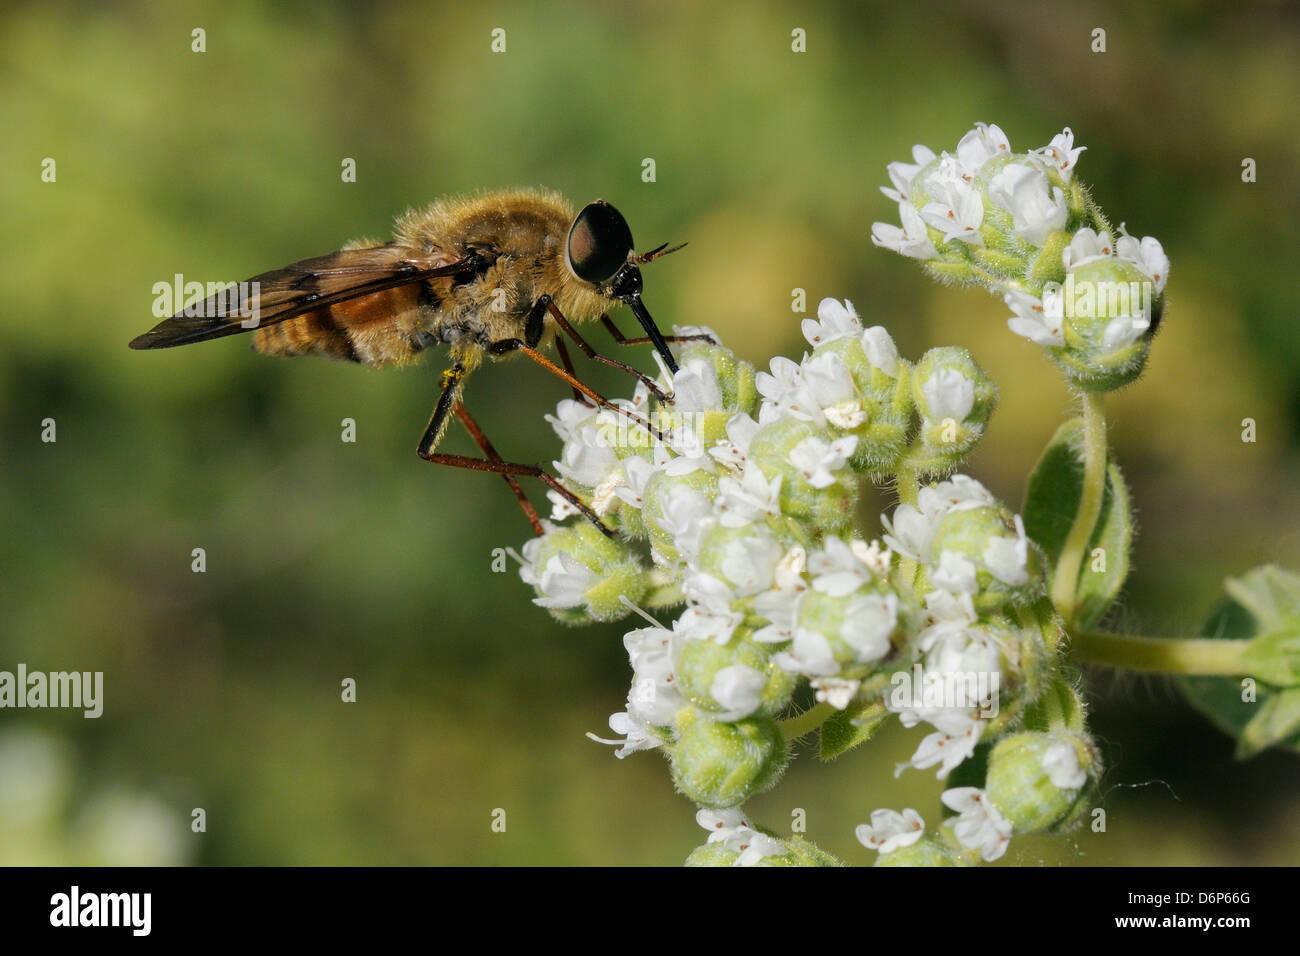 Caballo volar (Pangonius pyritosus) forrajeando para el néctar de orégano (Origanum onites cretense) flores, Lesbos (Lesbos), Grecia, Europa Foto de stock